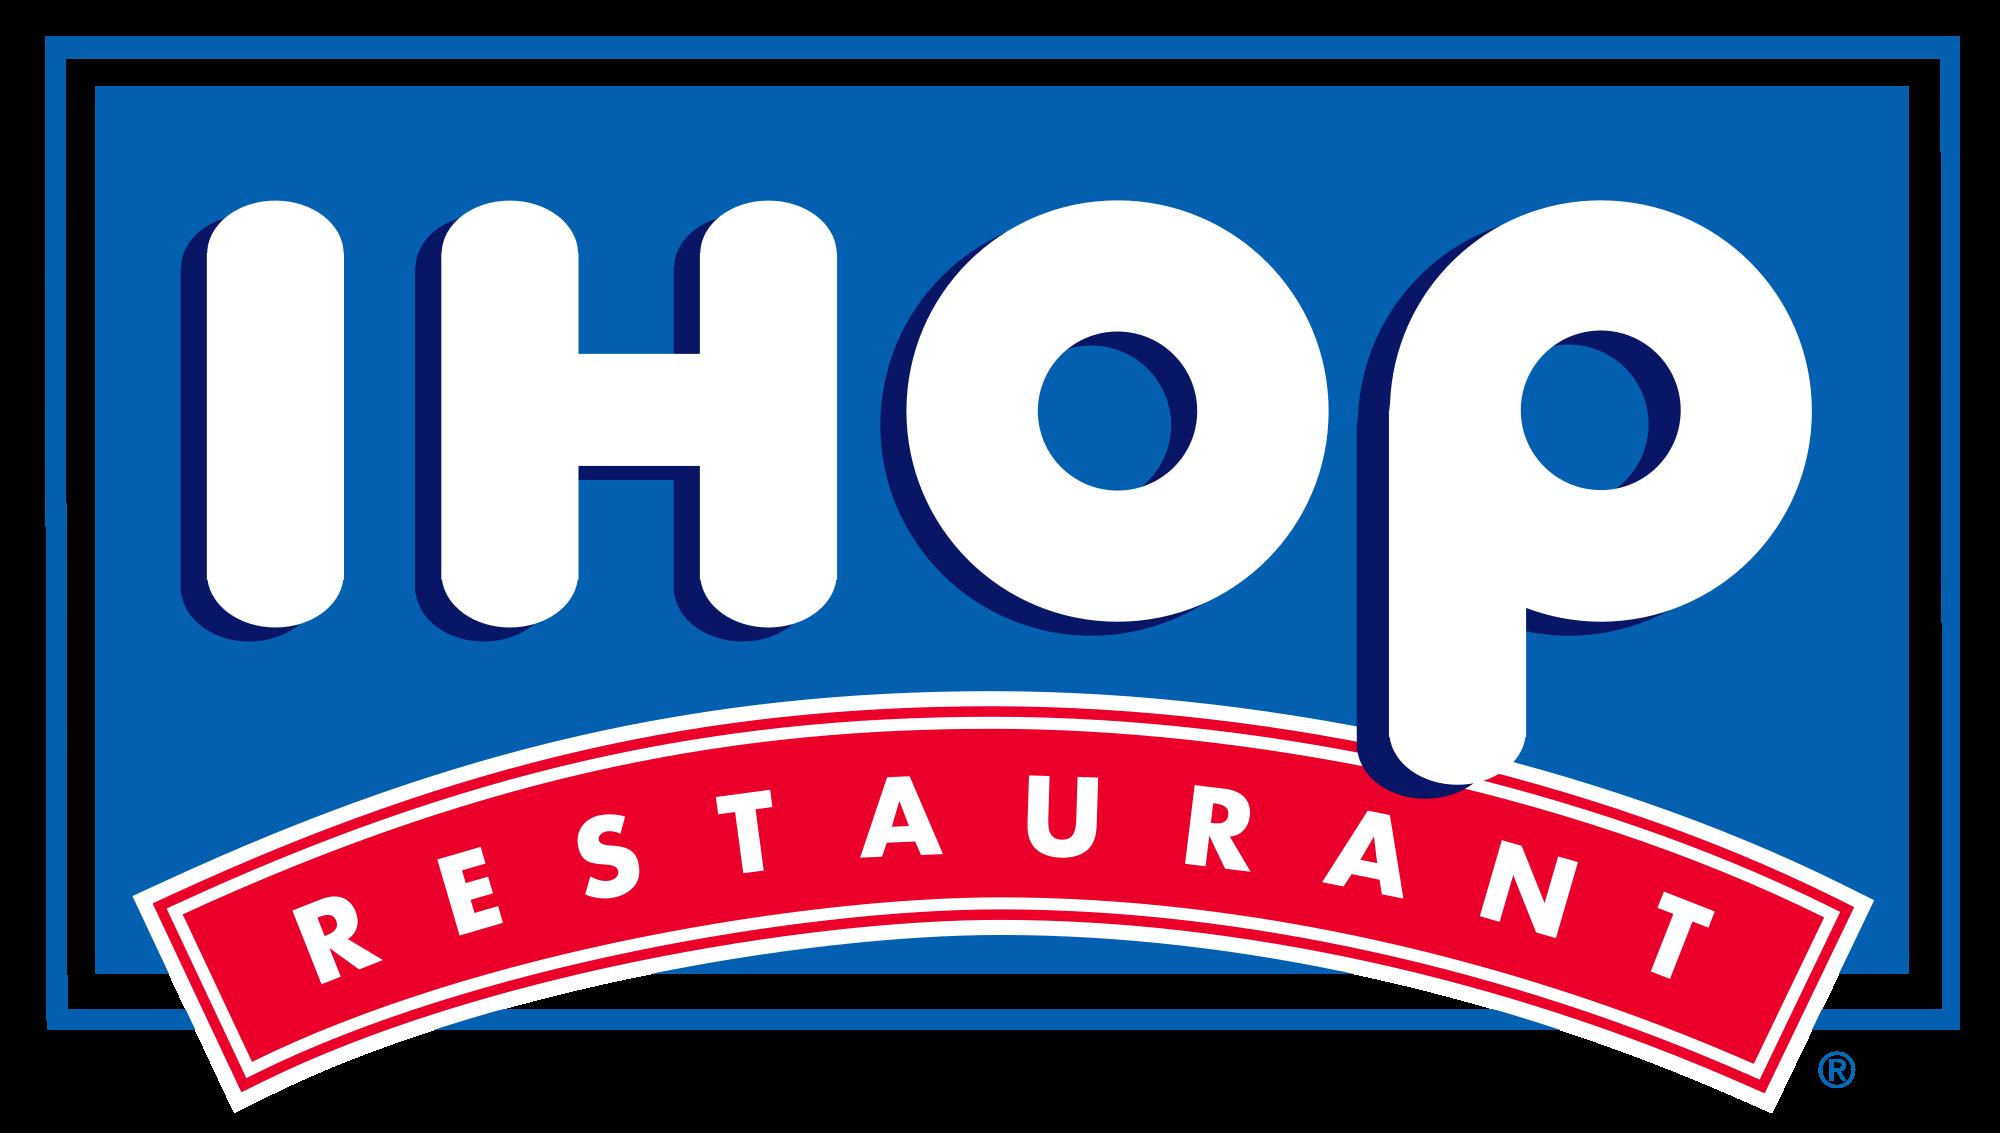 Restaurants clipart retaurant. Restaurant menu shop of